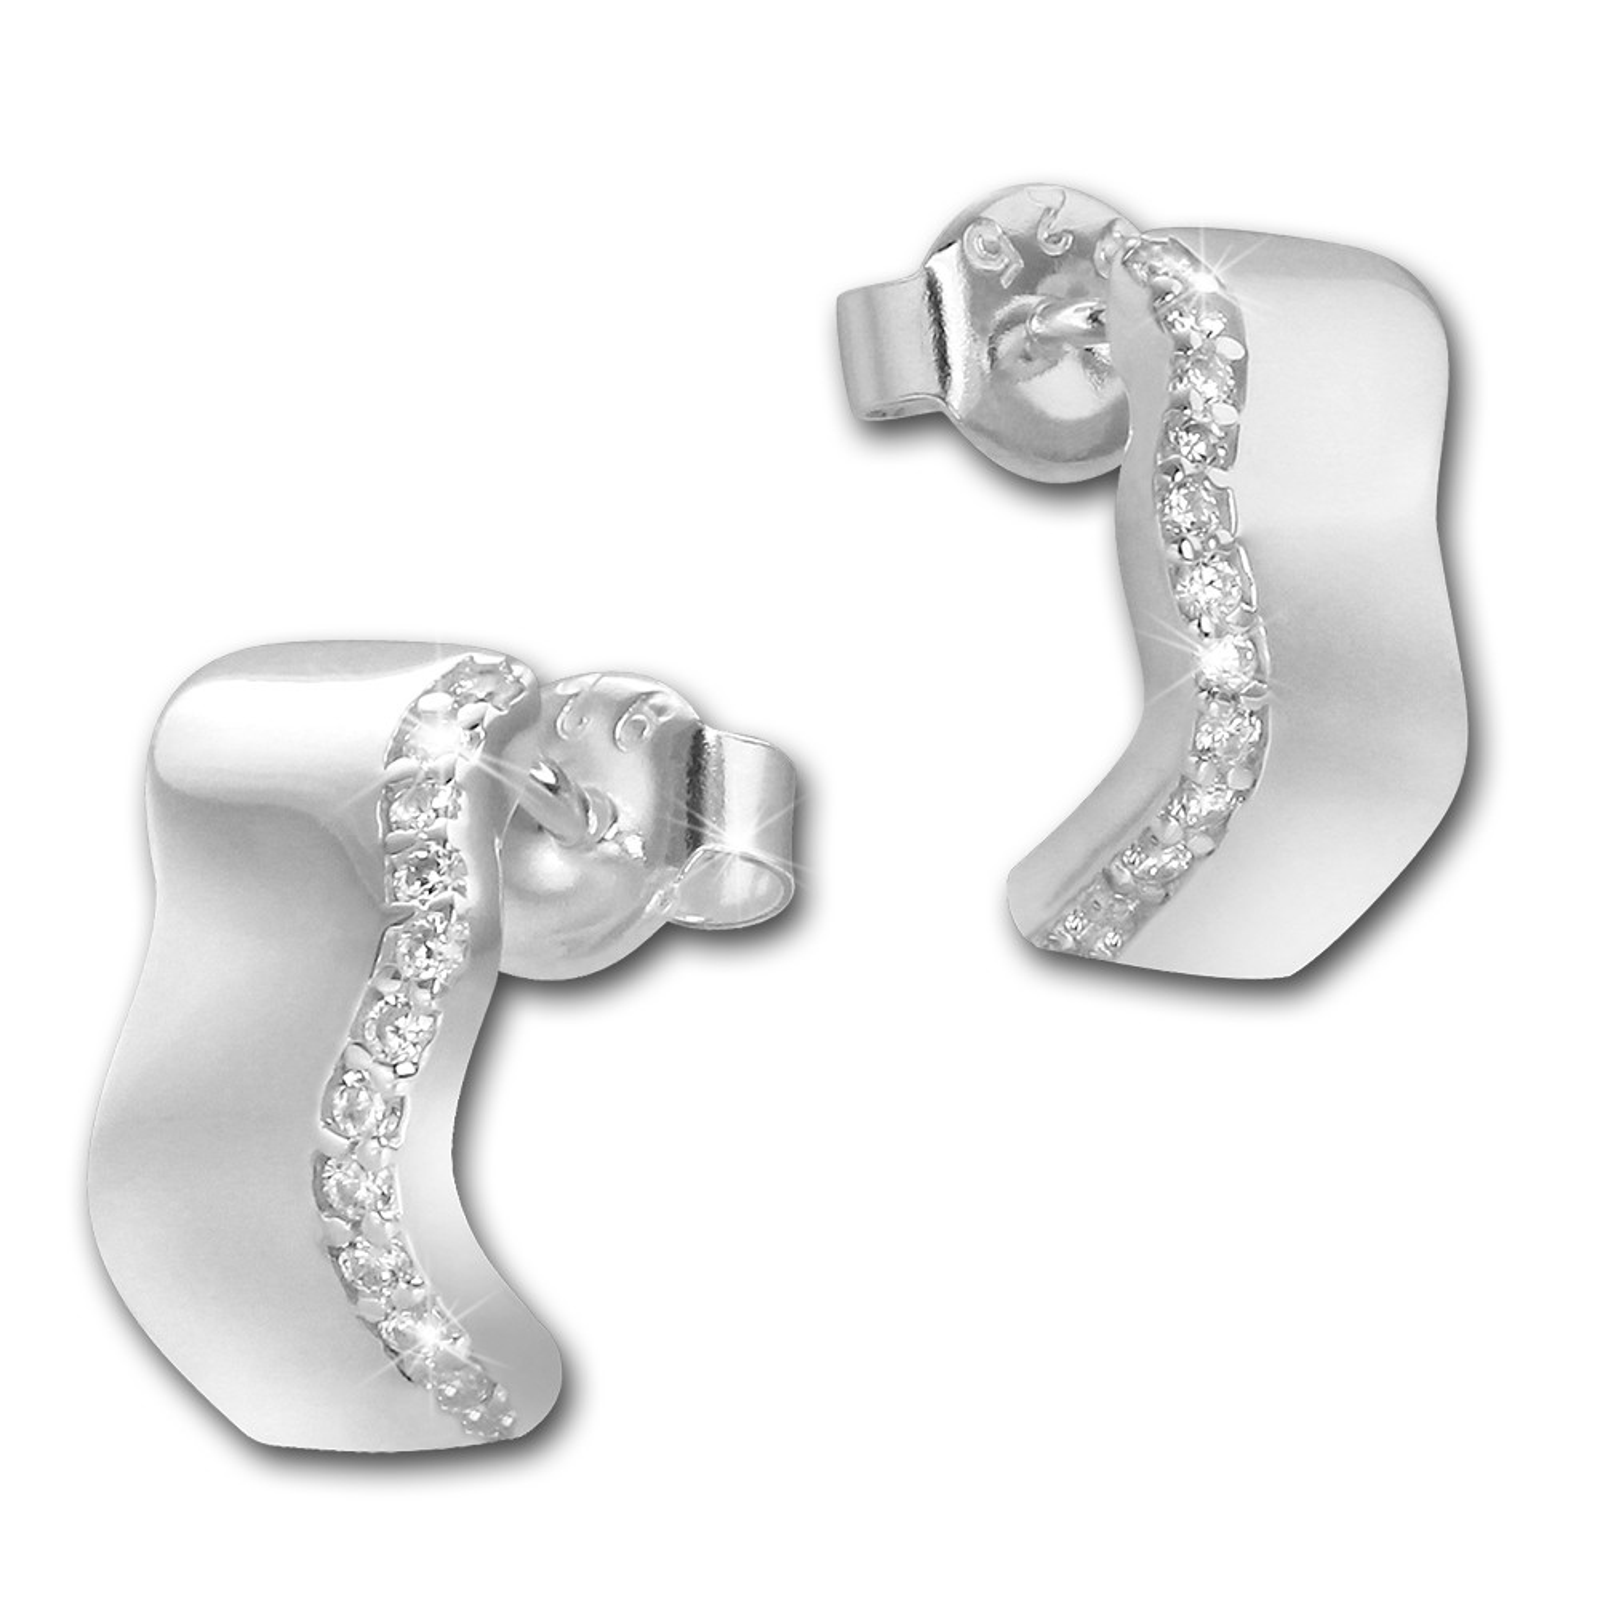 SilberDream Ohrstecker Welle Zirkonia weiß 925 Silber Damen Ohrring SDO4275W